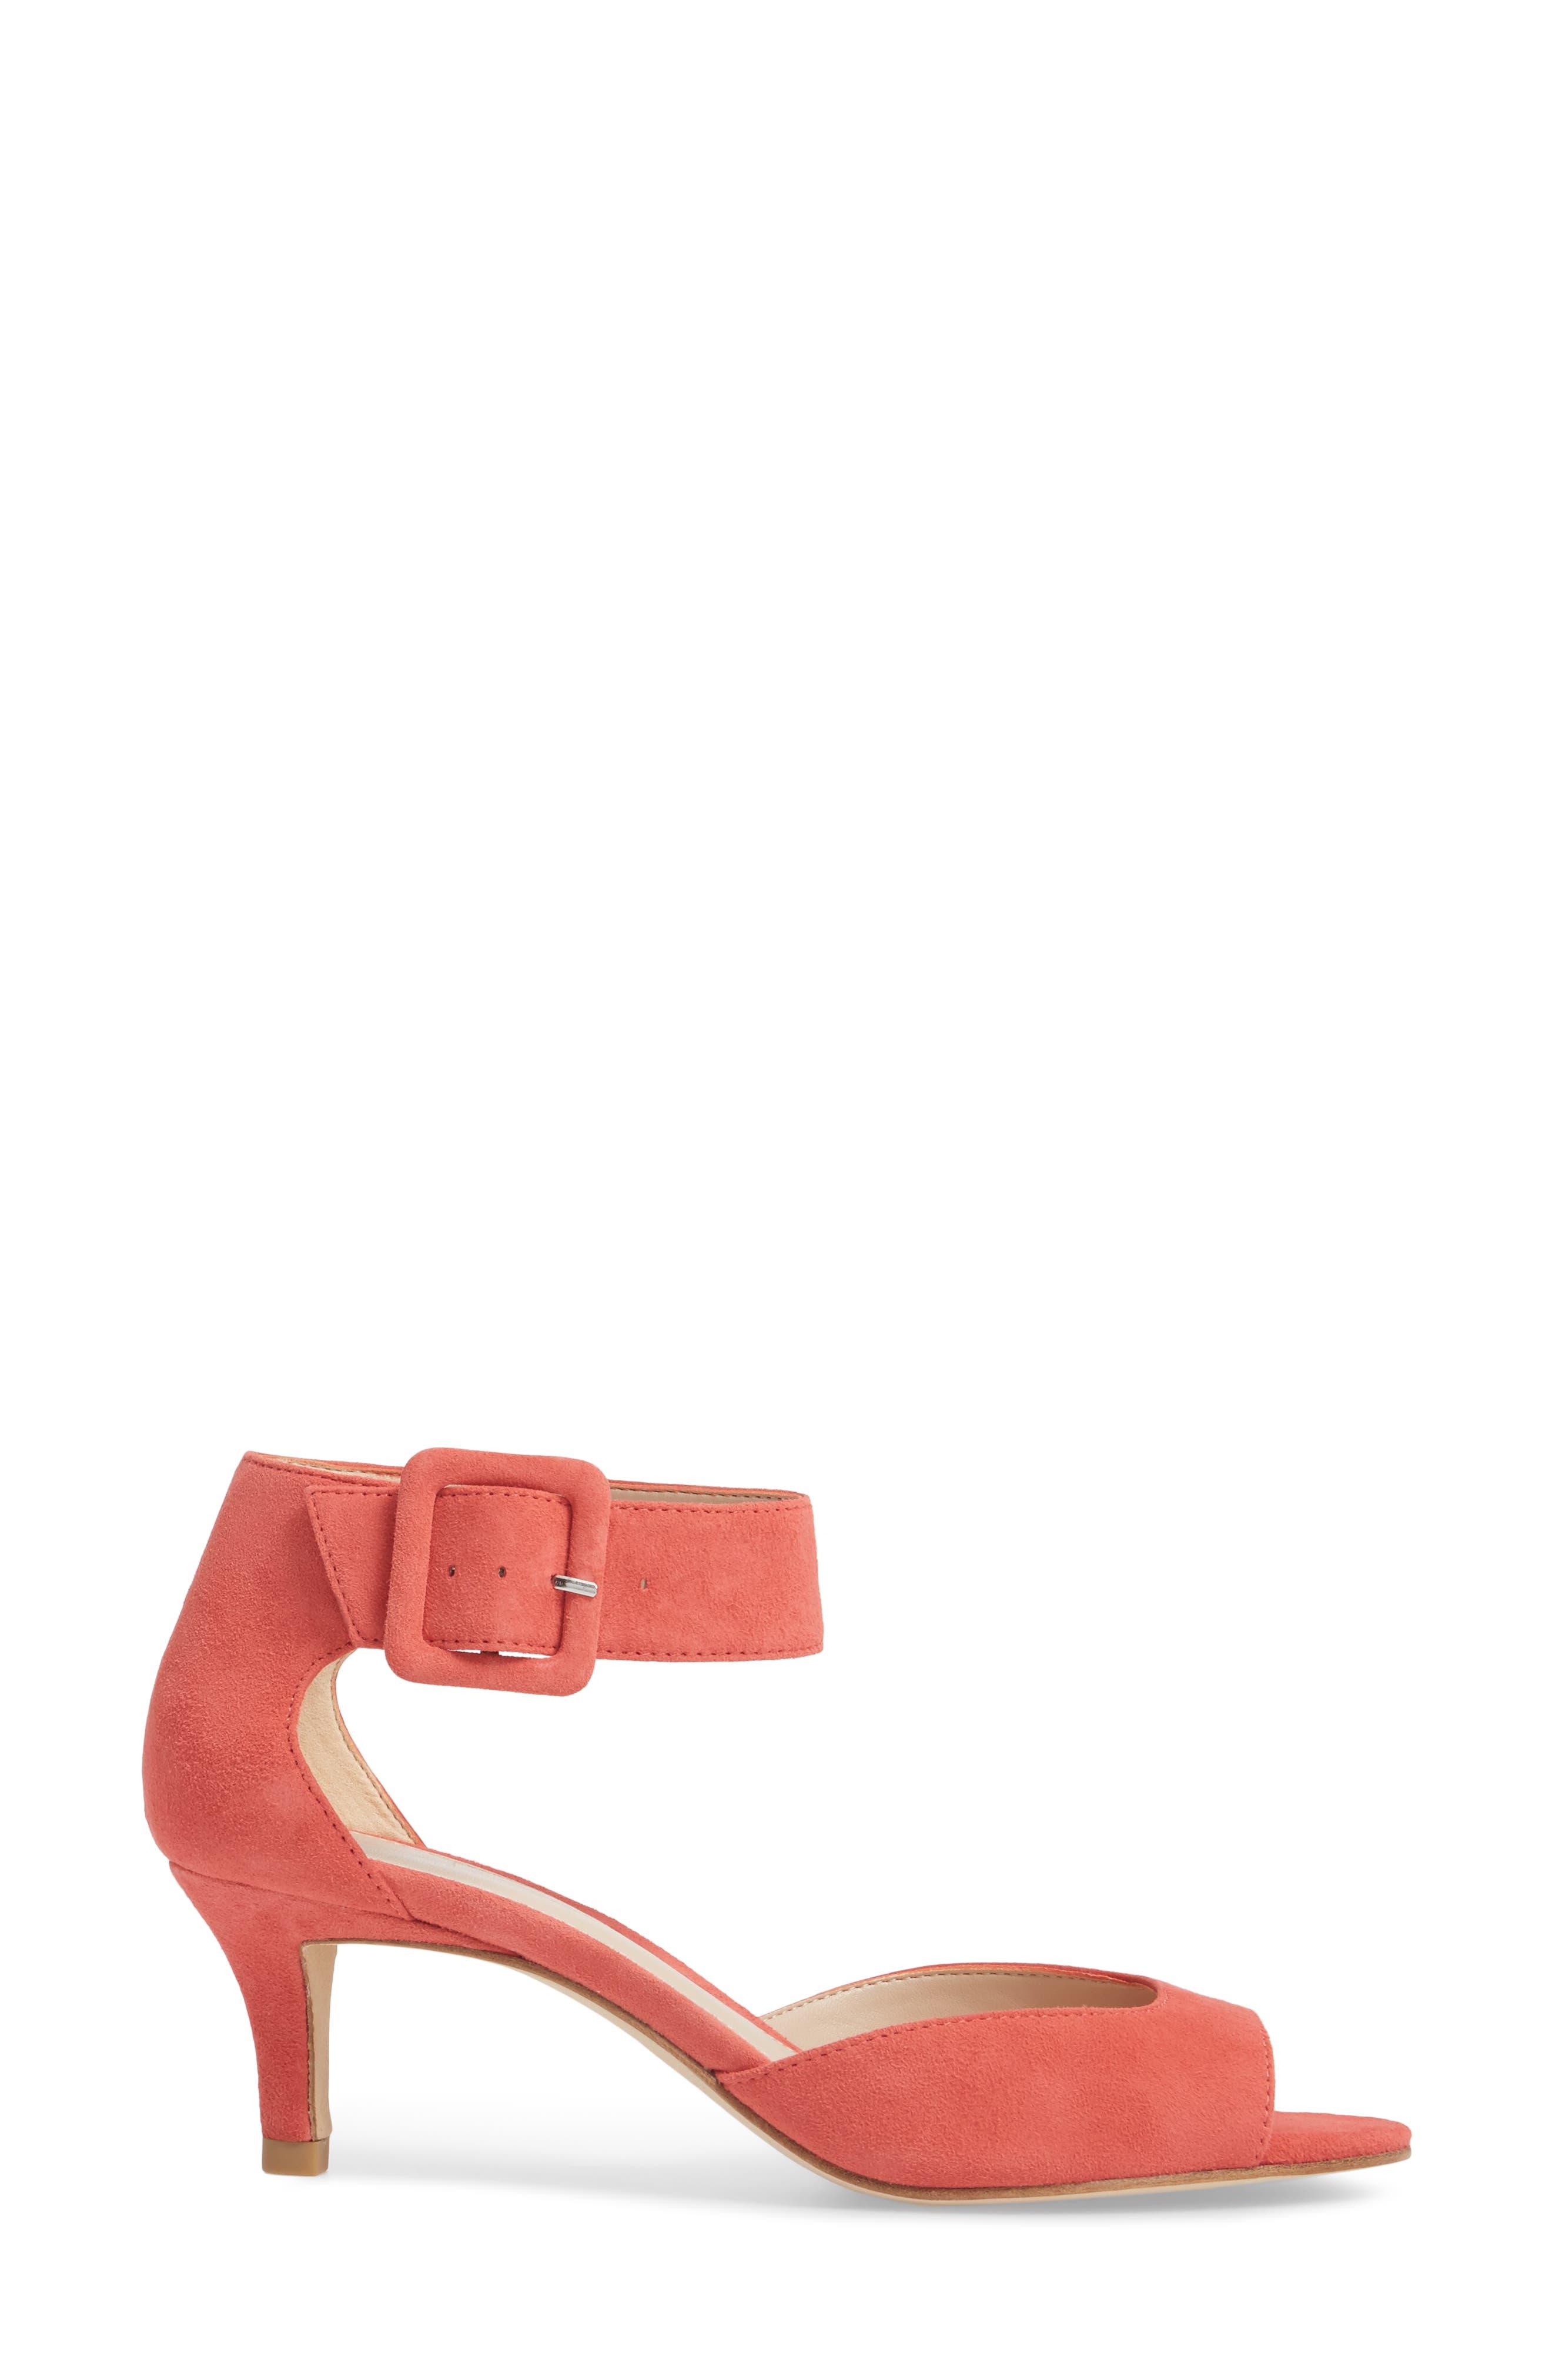 'Berlin' Ankle Strap Sandal,                             Alternate thumbnail 27, color,